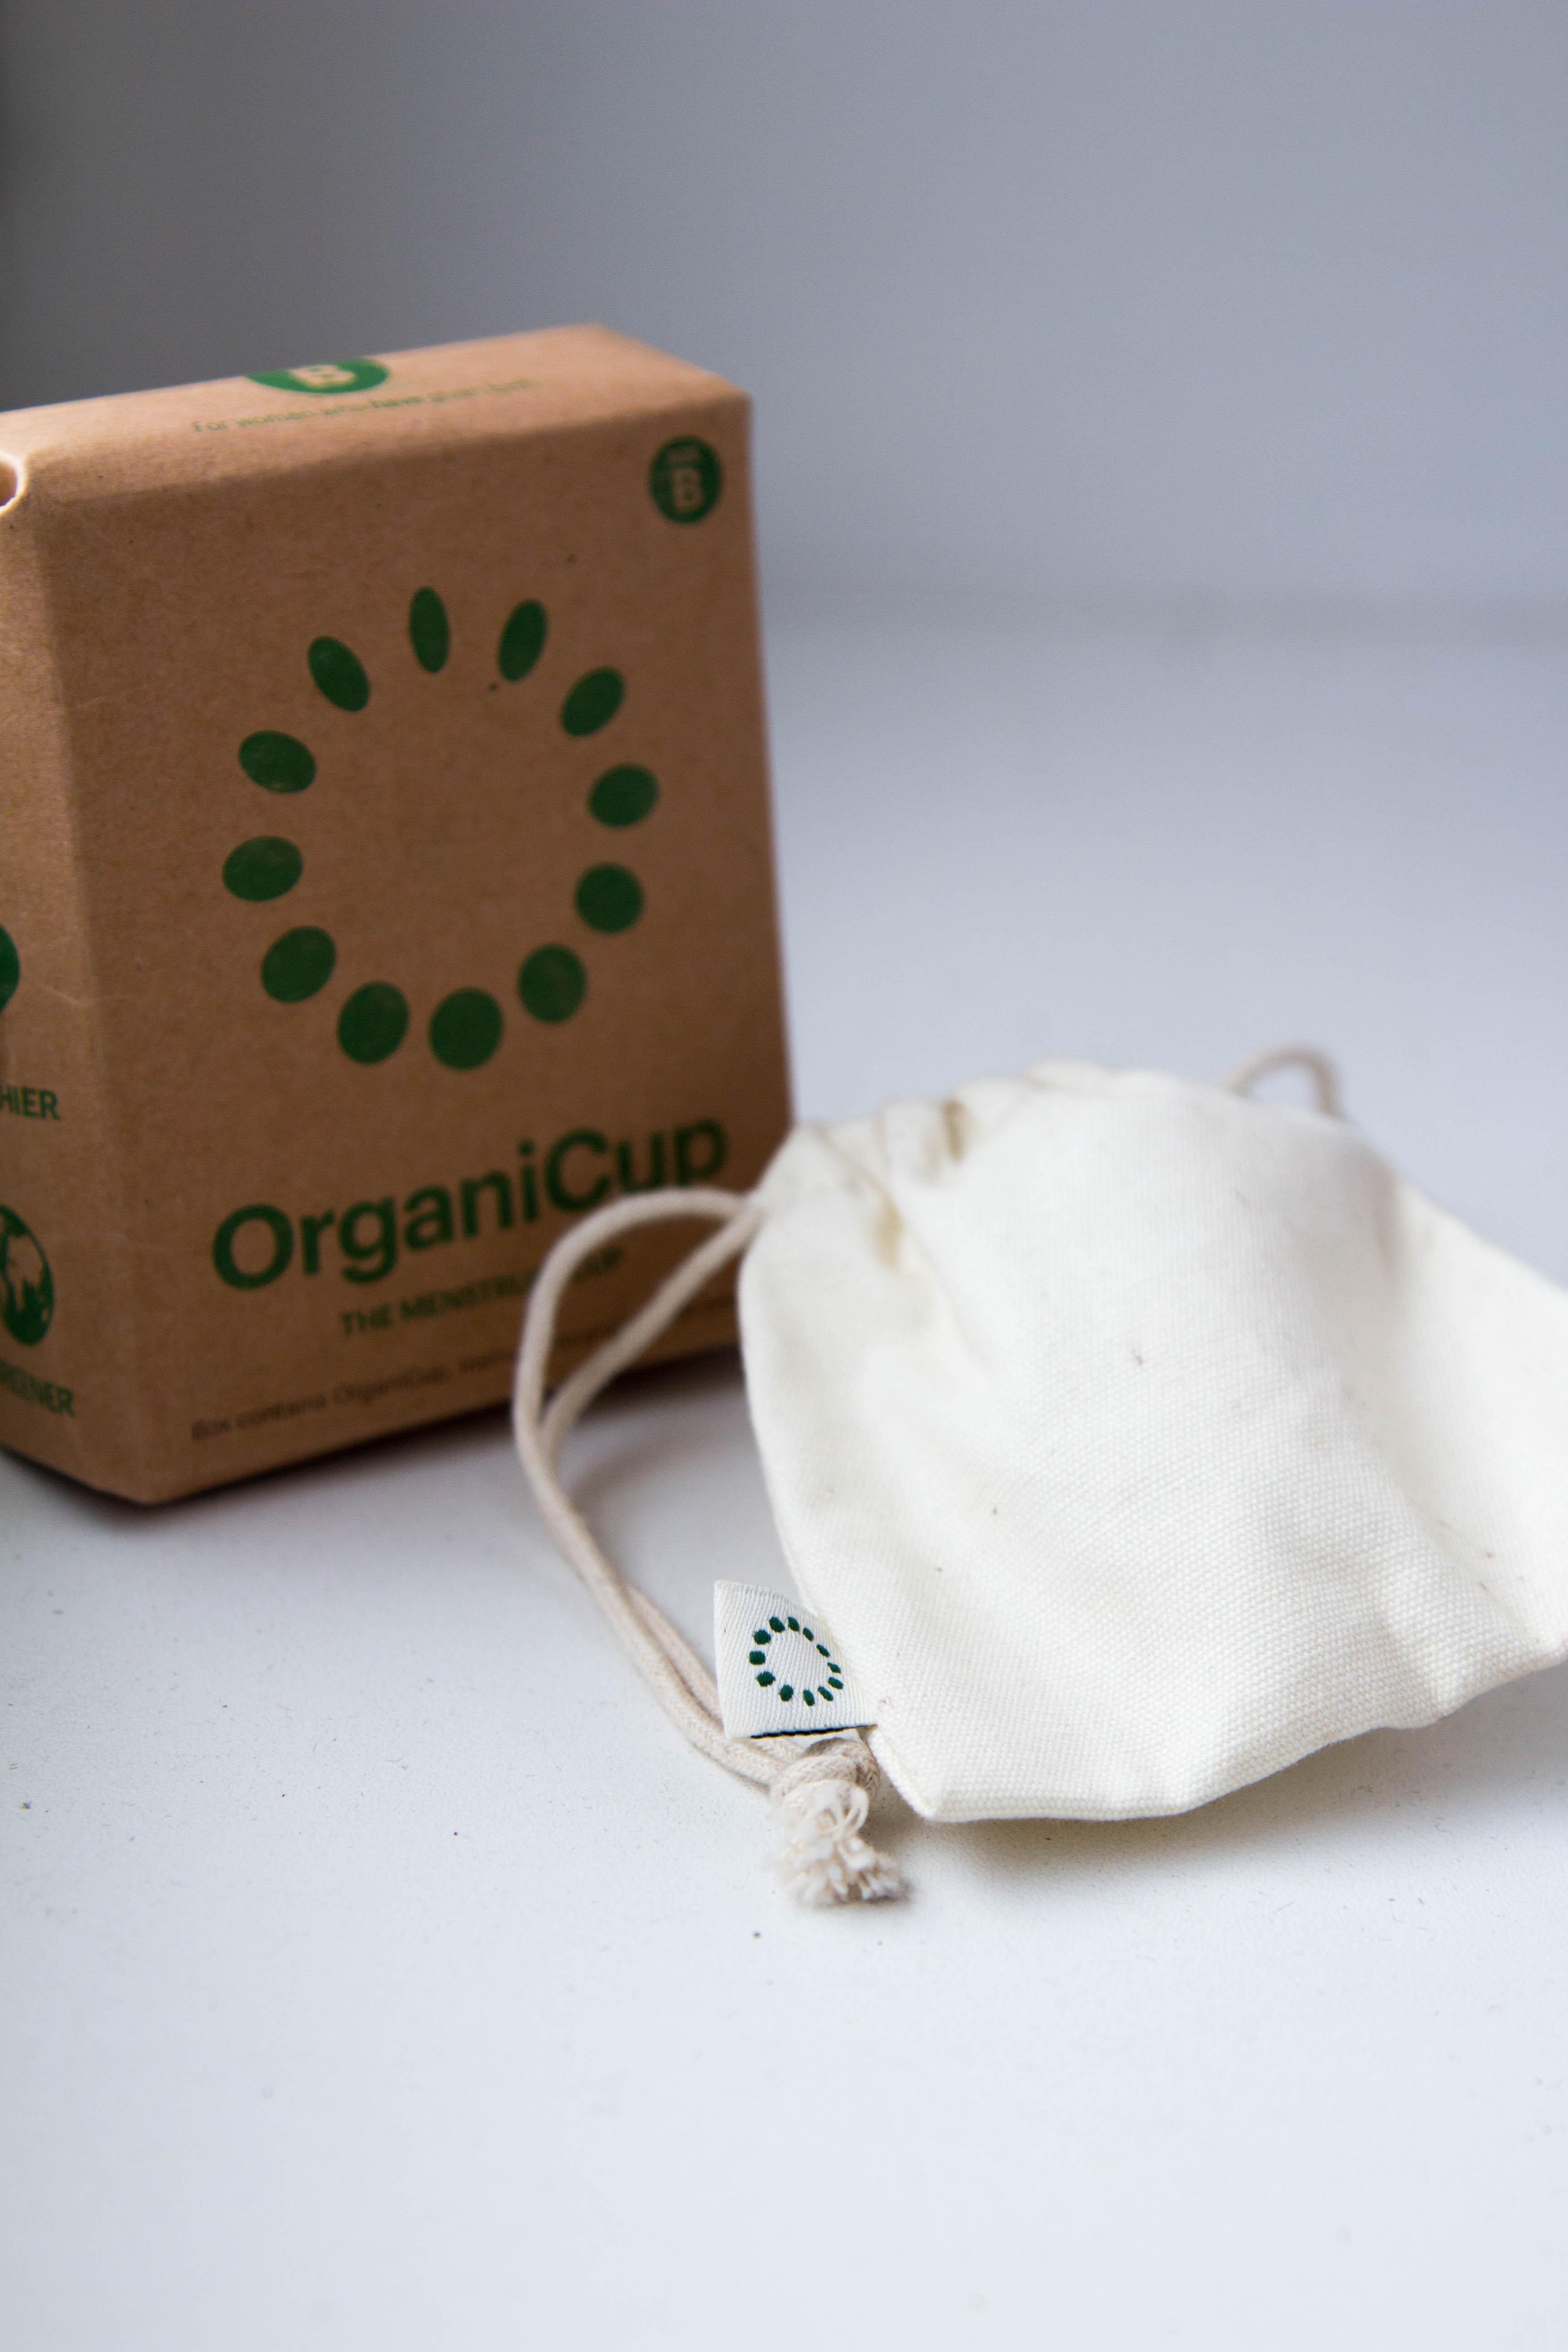 Organicup tests